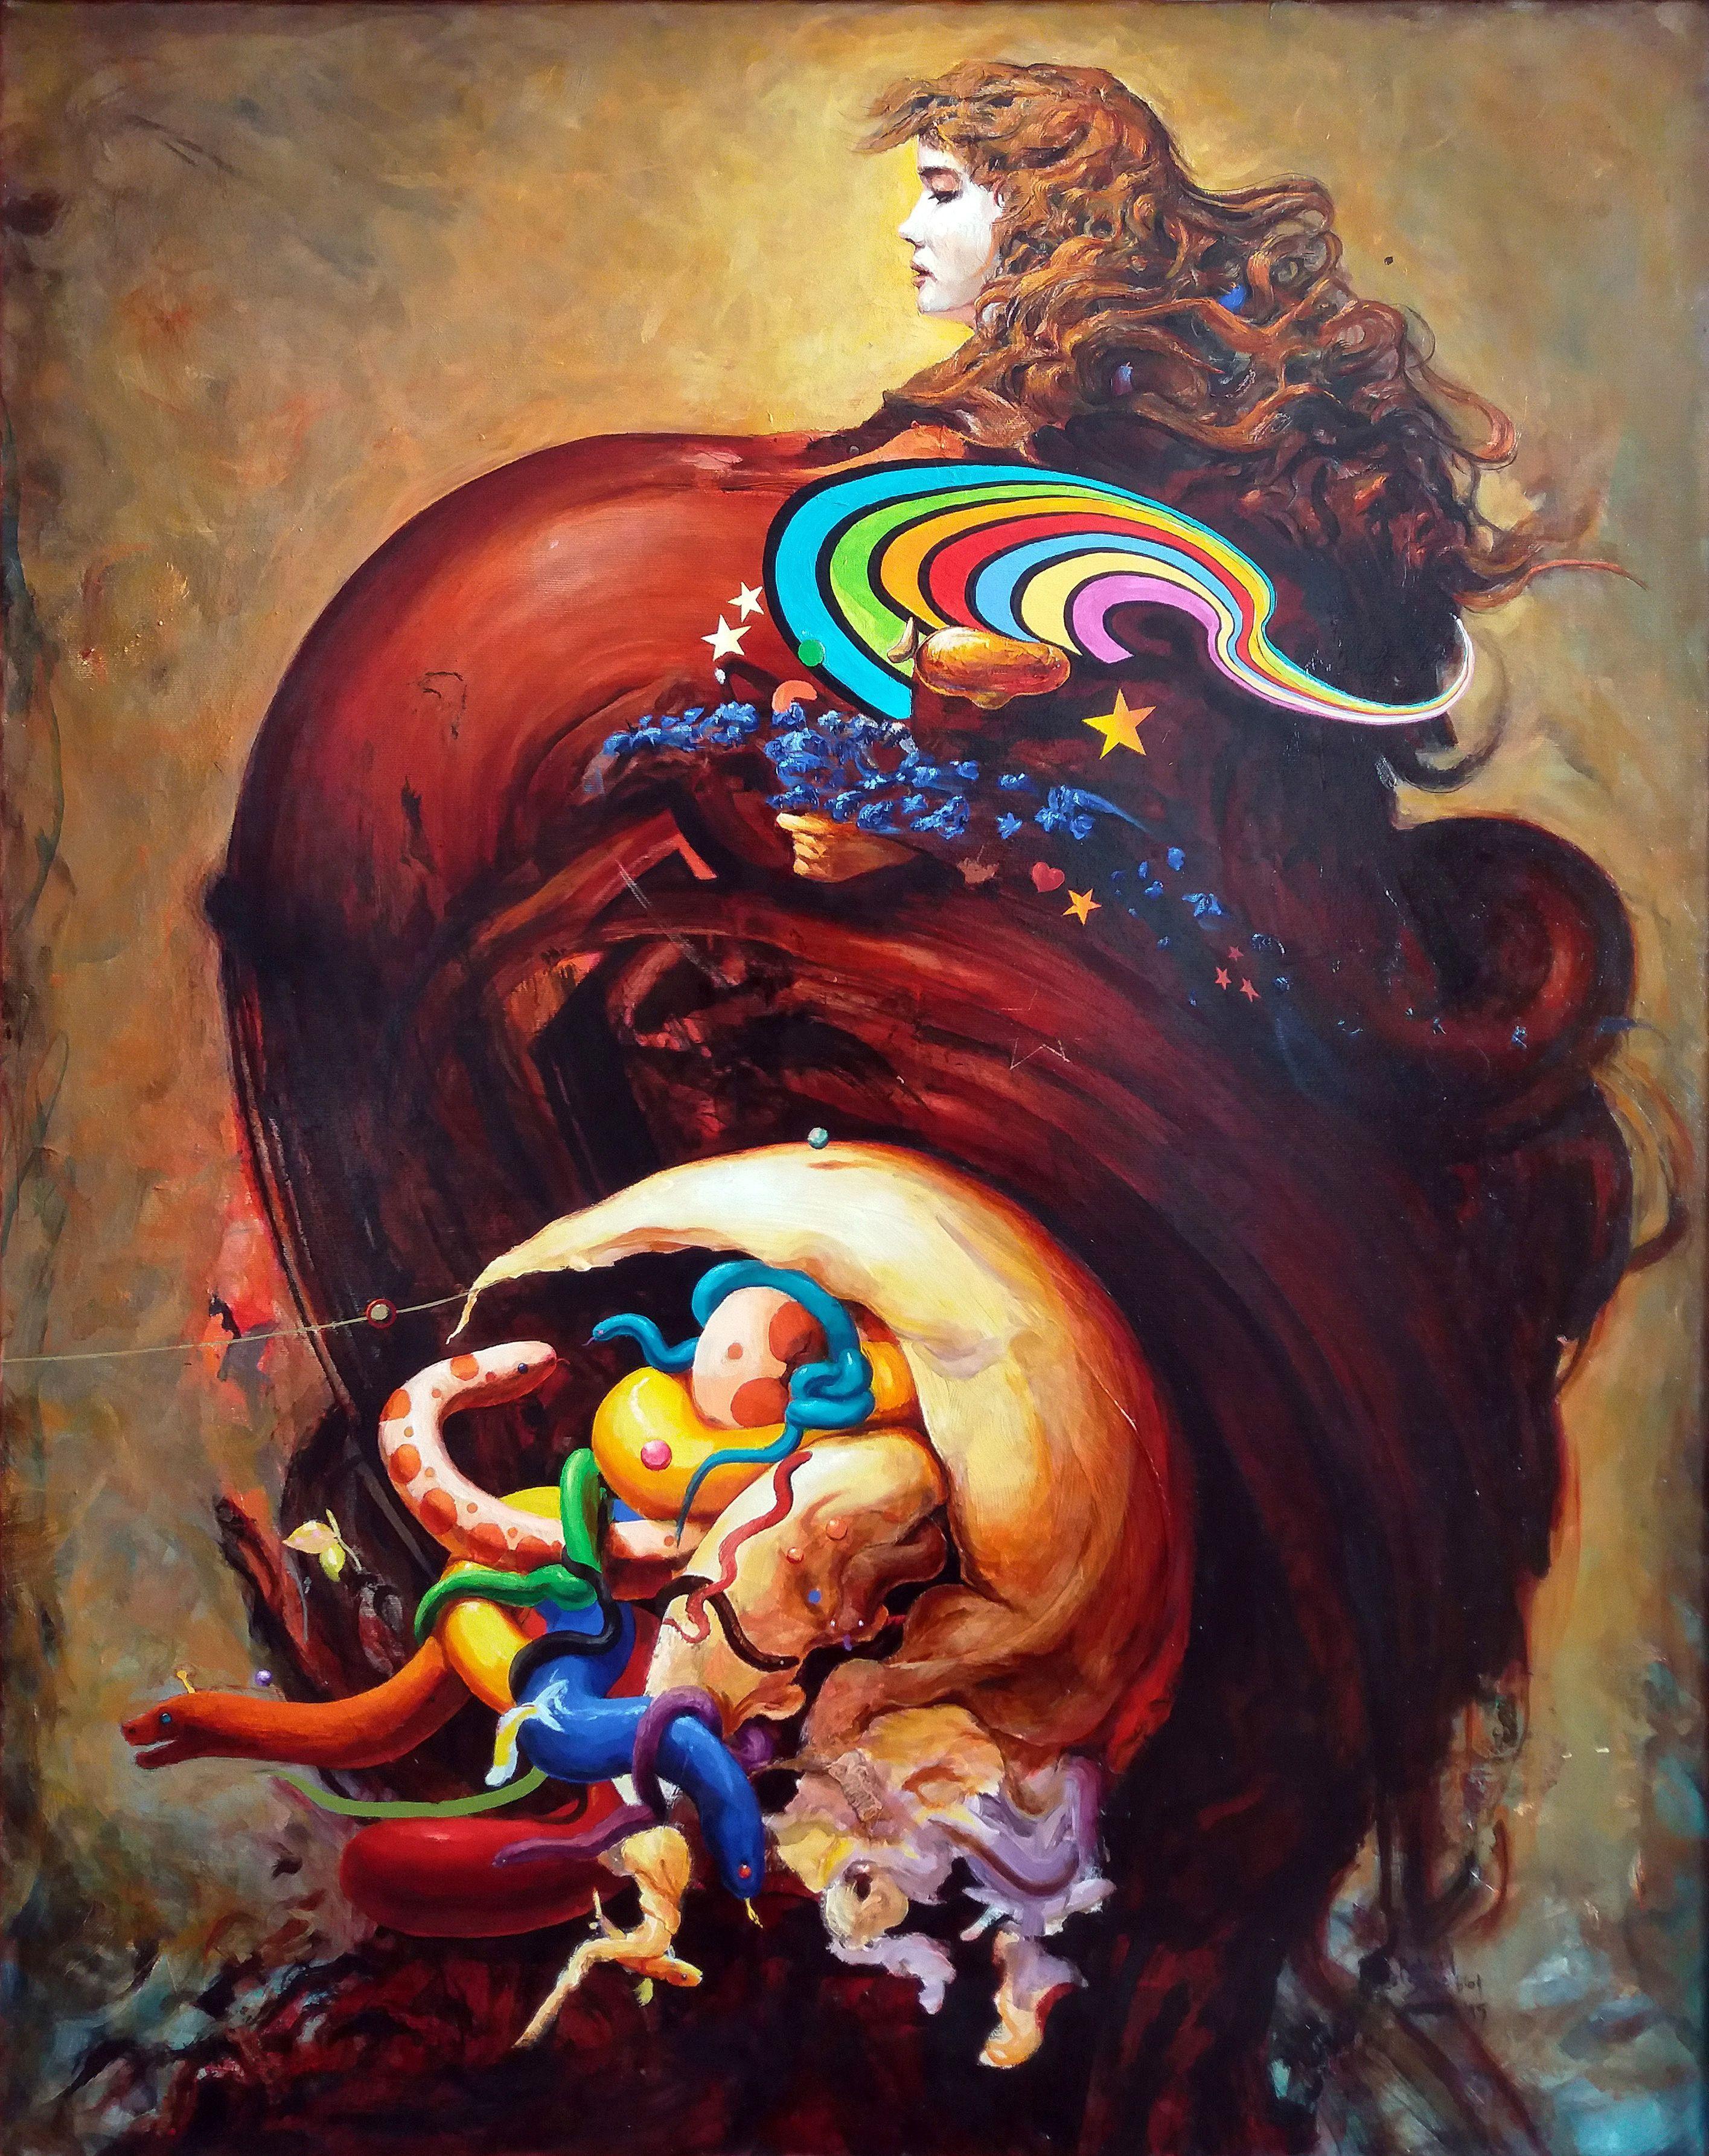 Singularity portrait, Painting, Oil on Canvas